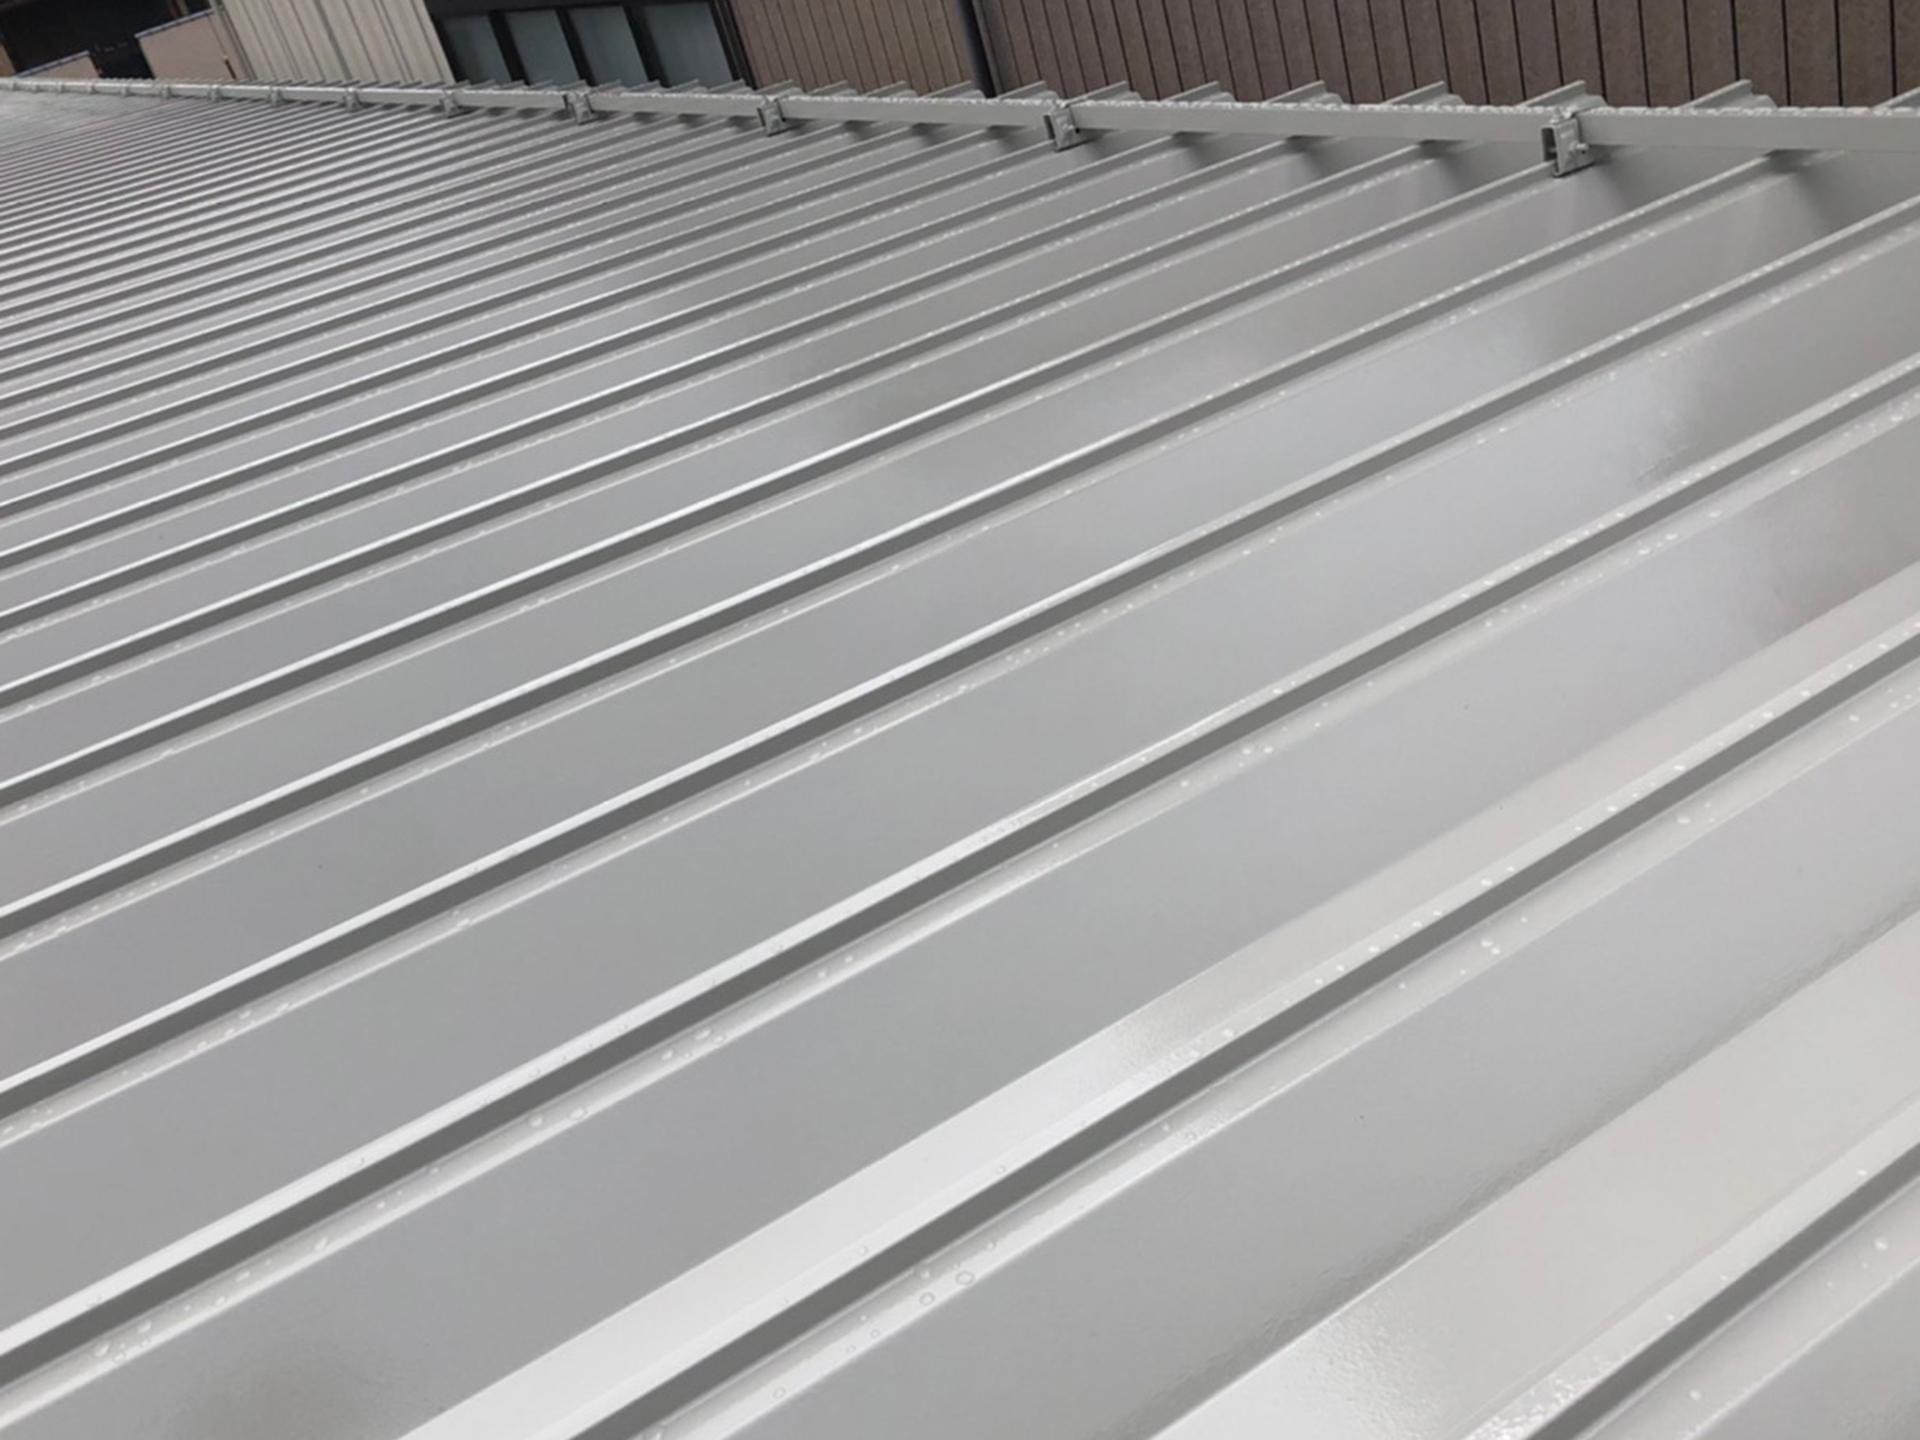 DG駐車場 屋根付きカーポート 屋根 塗装後